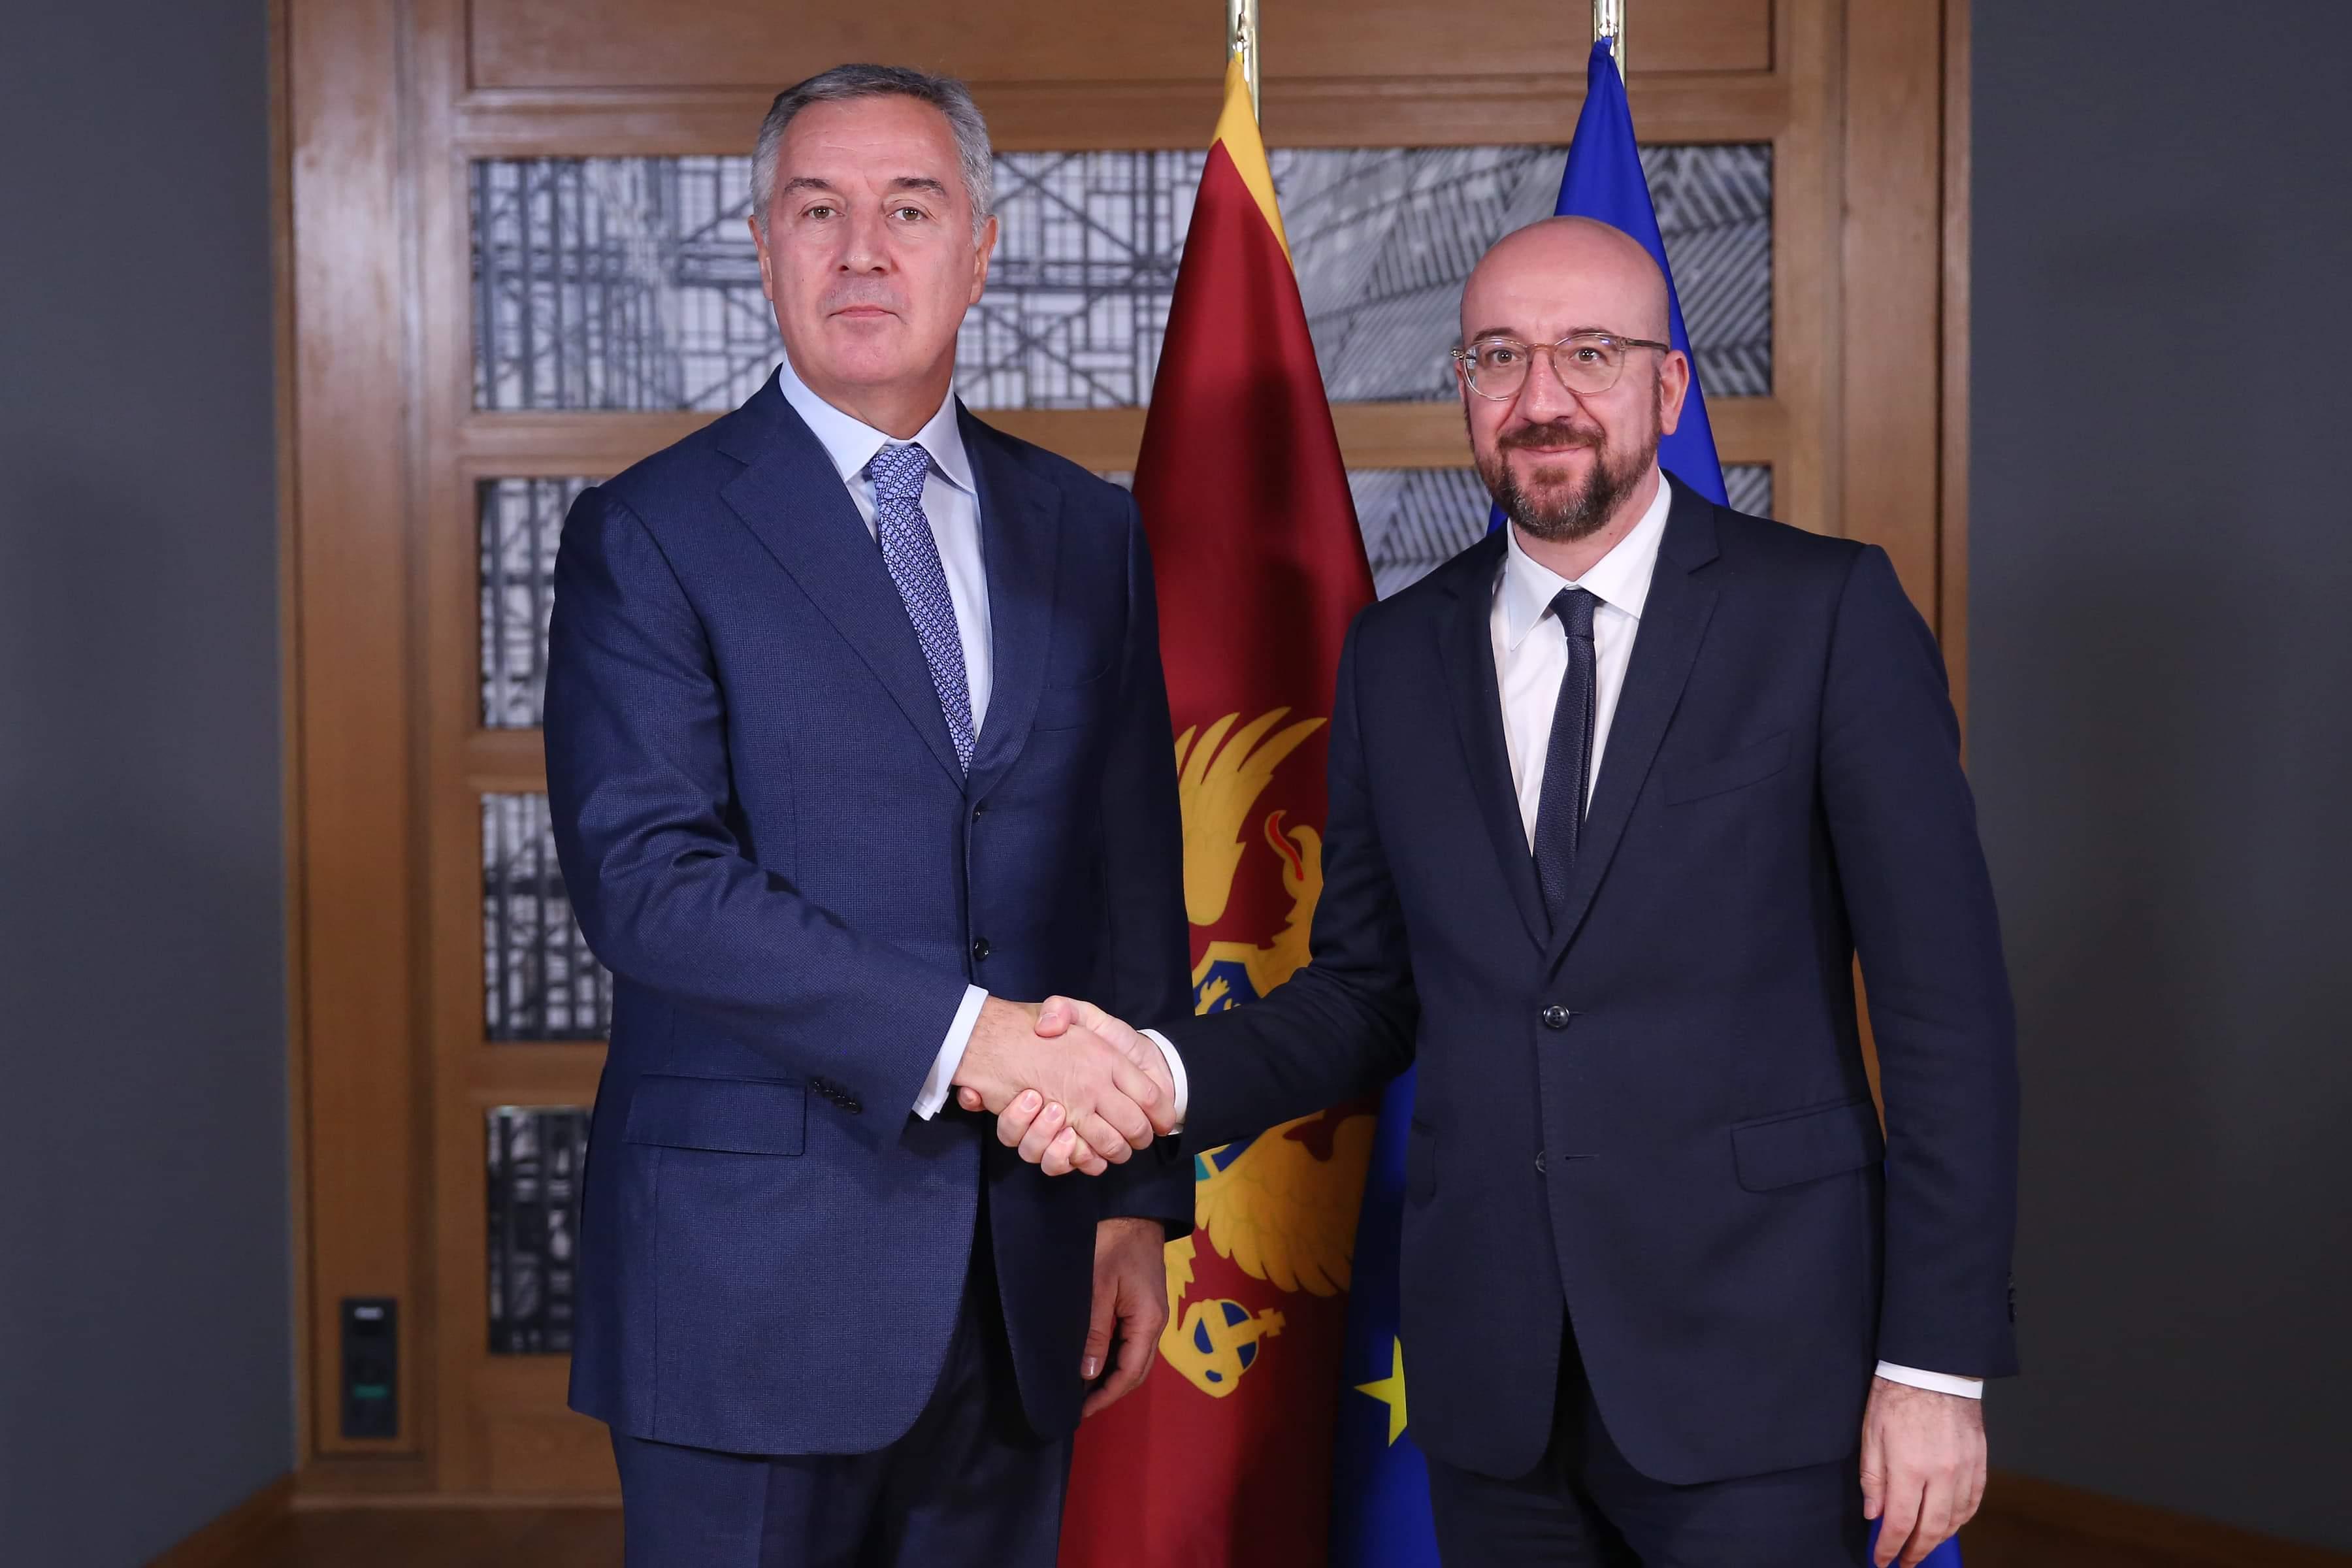 Đukanović met with Michel in Brussels